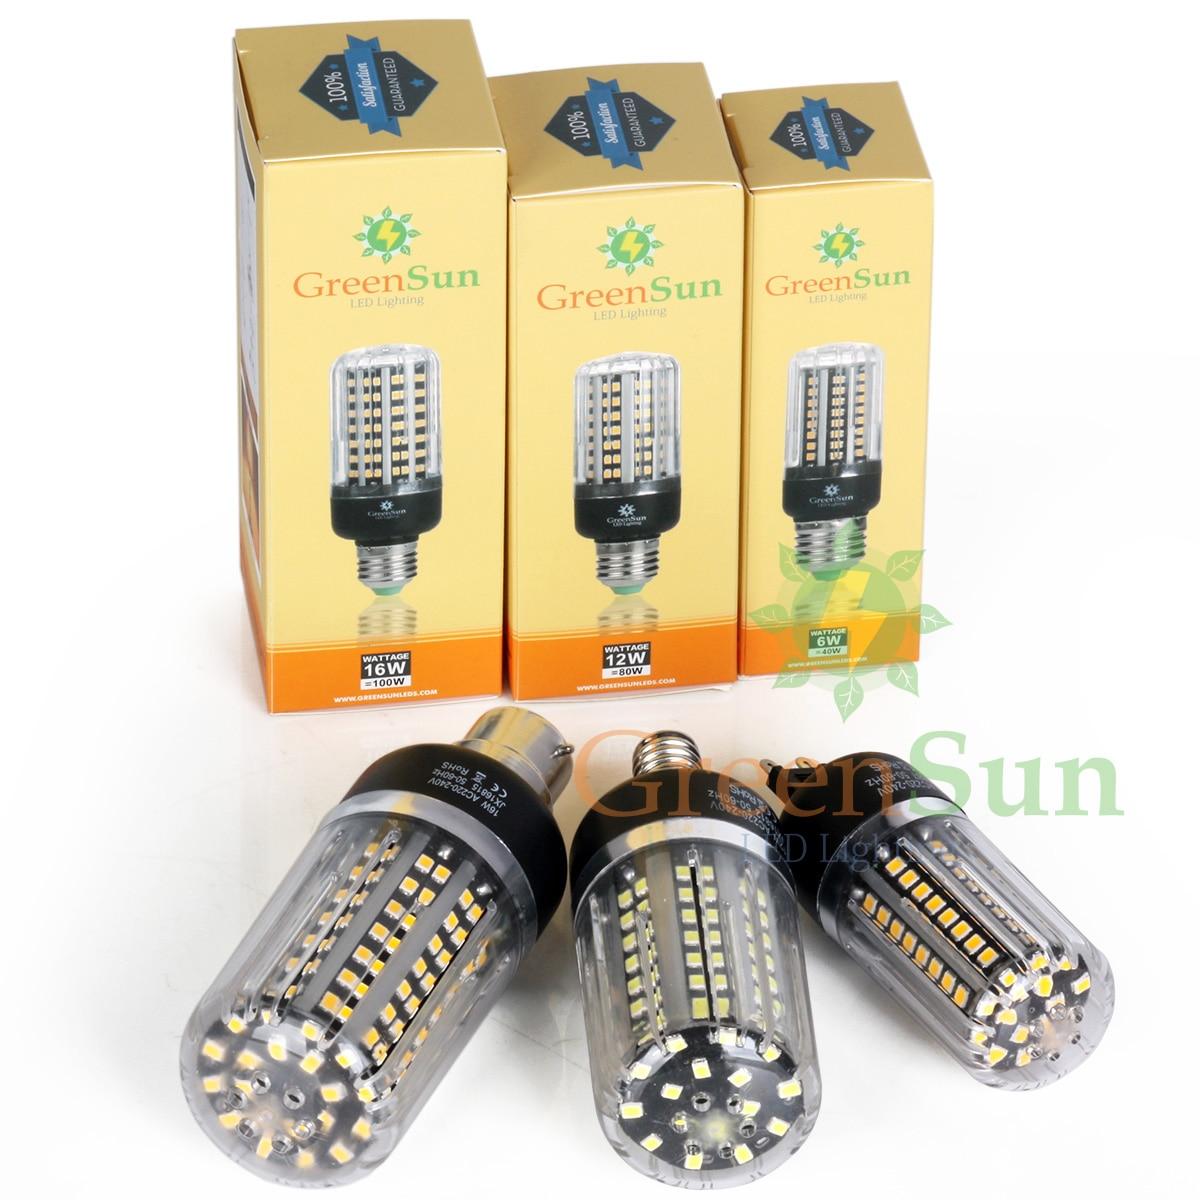 Dimmable High Lumens 6W 12W 16W 2835 SMD LED Corn Bulb Light E14 E27 G9 GU10 B22 LED Light Lamp 220V Energy Saving No Flicker<br><br>Aliexpress